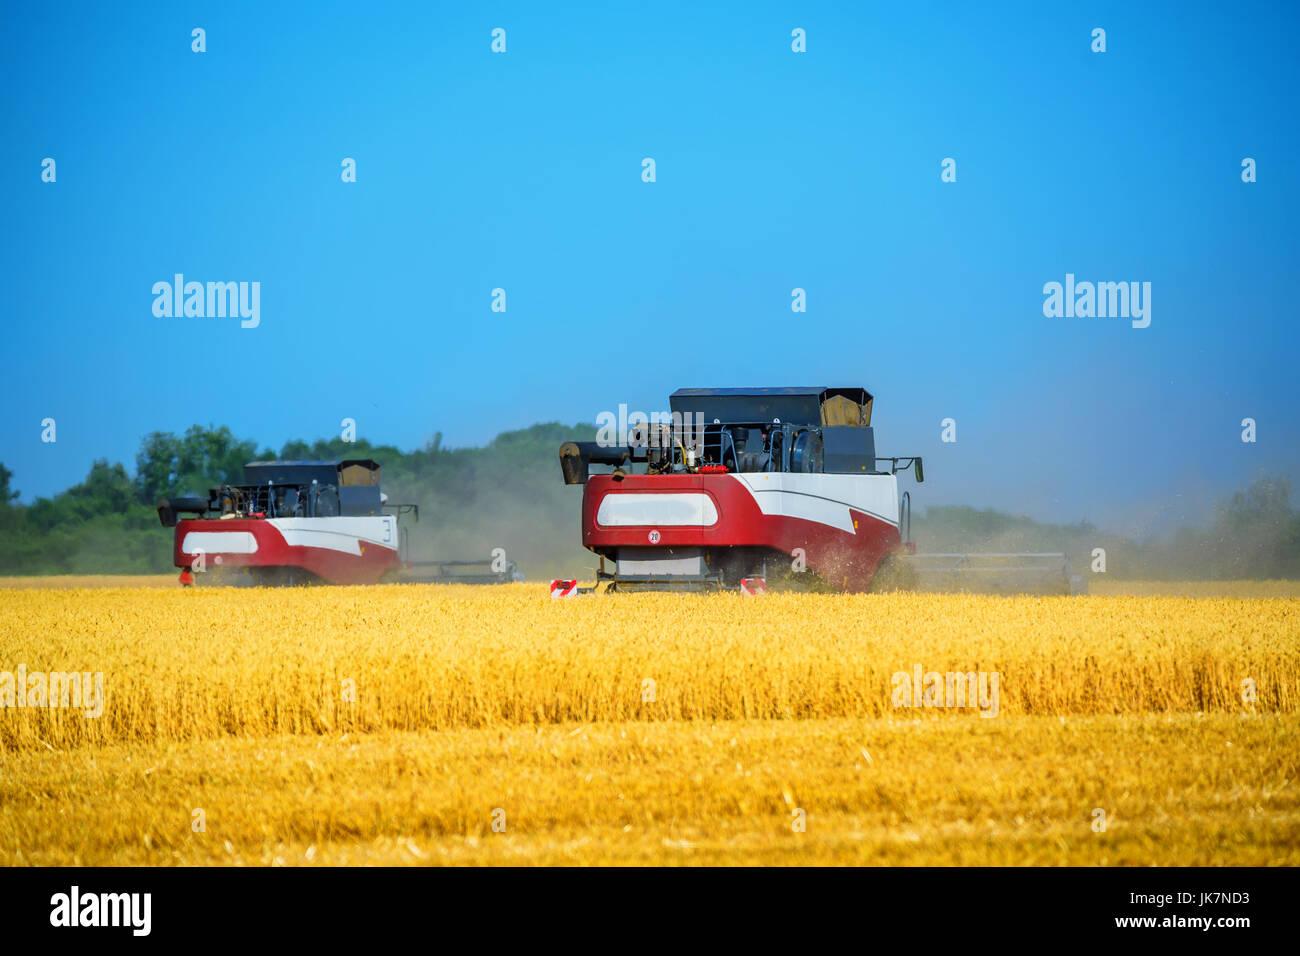 Grain harvesting combines work in wheat field - Stock Image